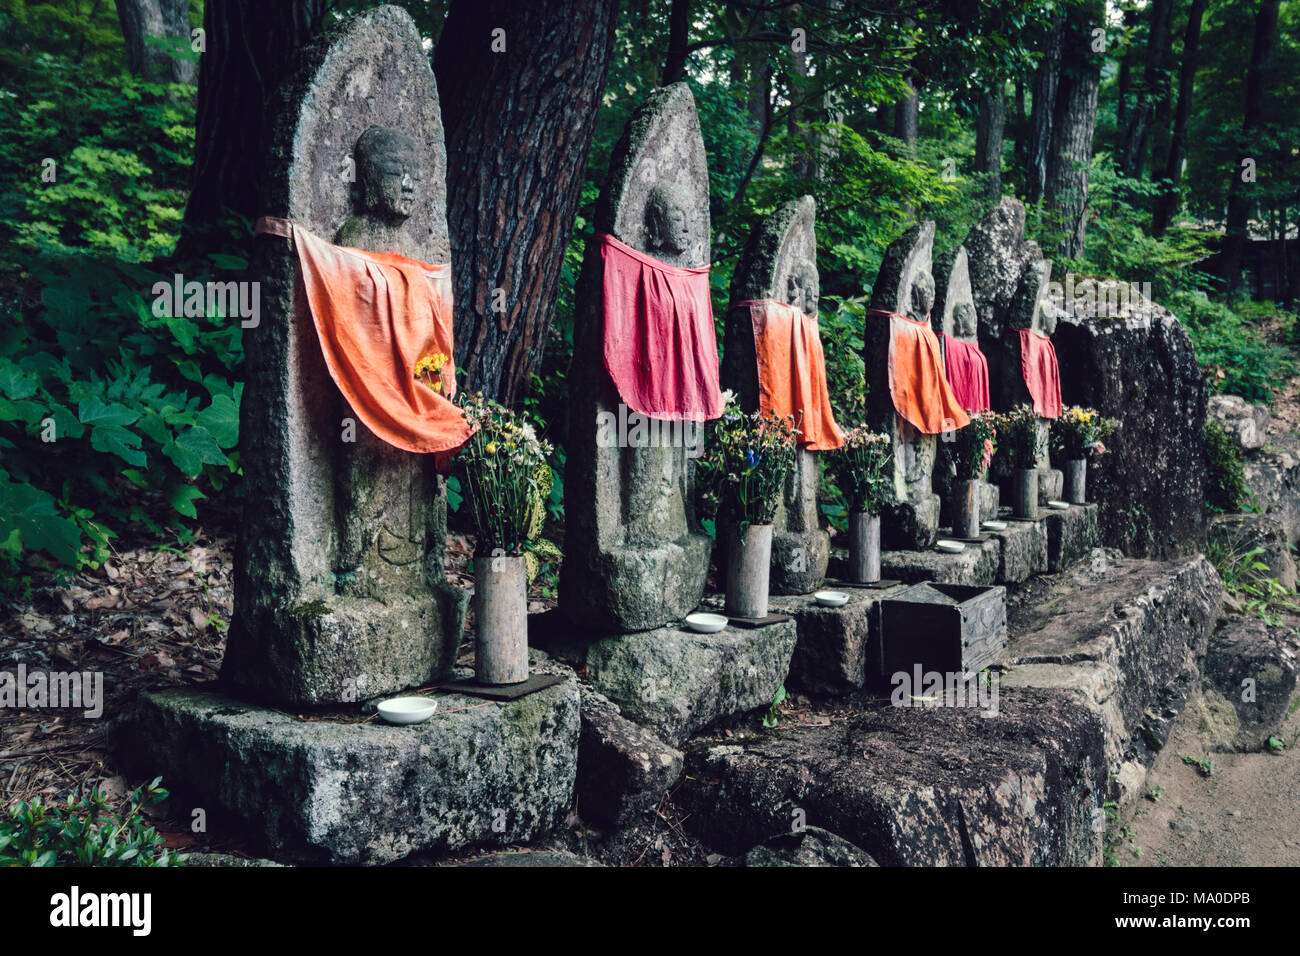 Hida Folk Village (Takayama, Japan) - Jizō statues wearing Red Bibs - Stock Image